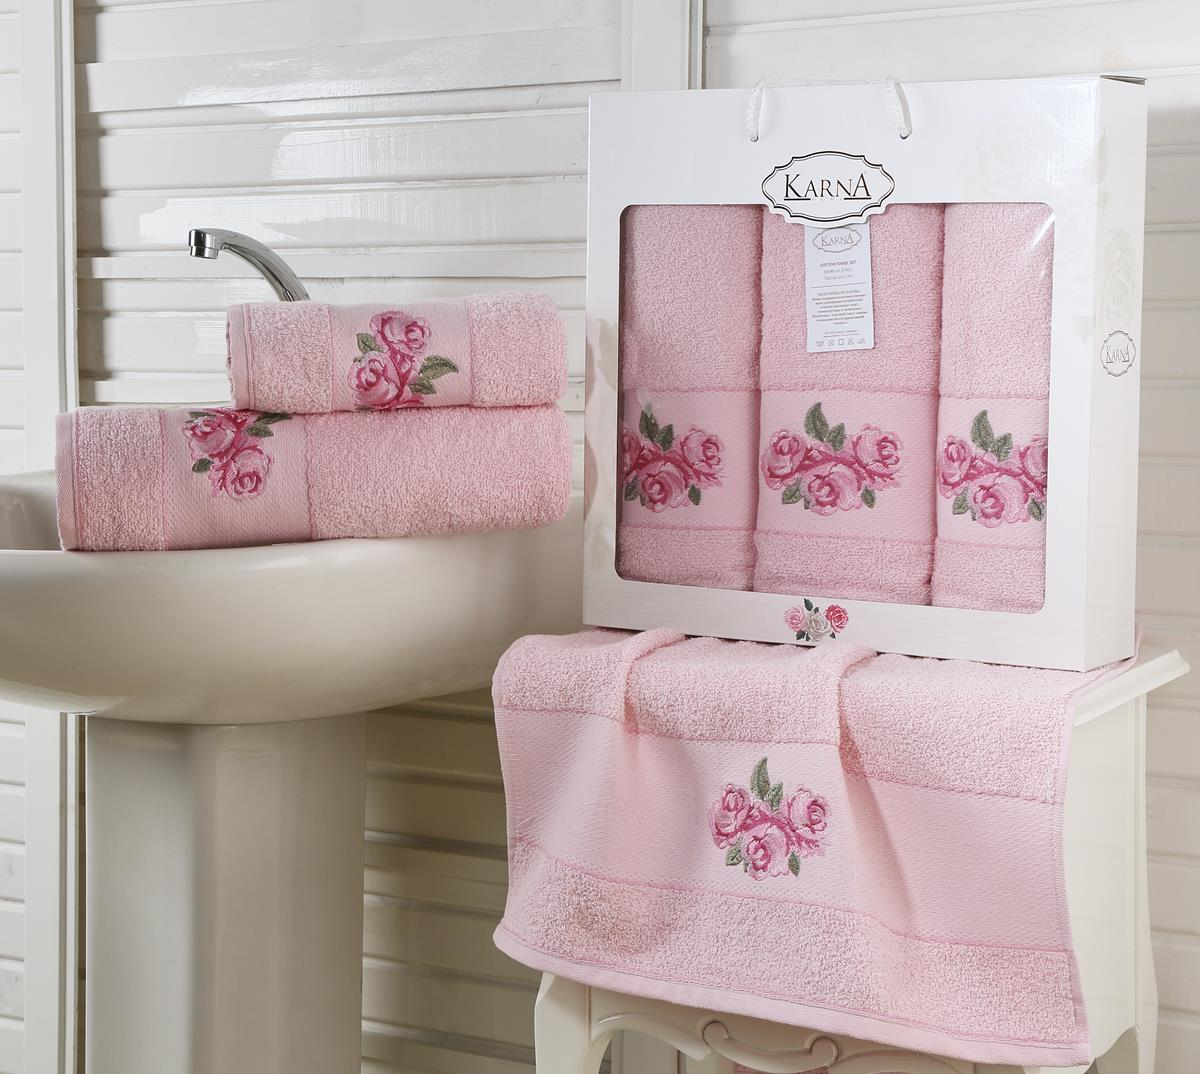 Полотенца Karna Полотенце Havin Цвет: Розовый (Набор) наматрасник karna с пропиткой 120x200 см